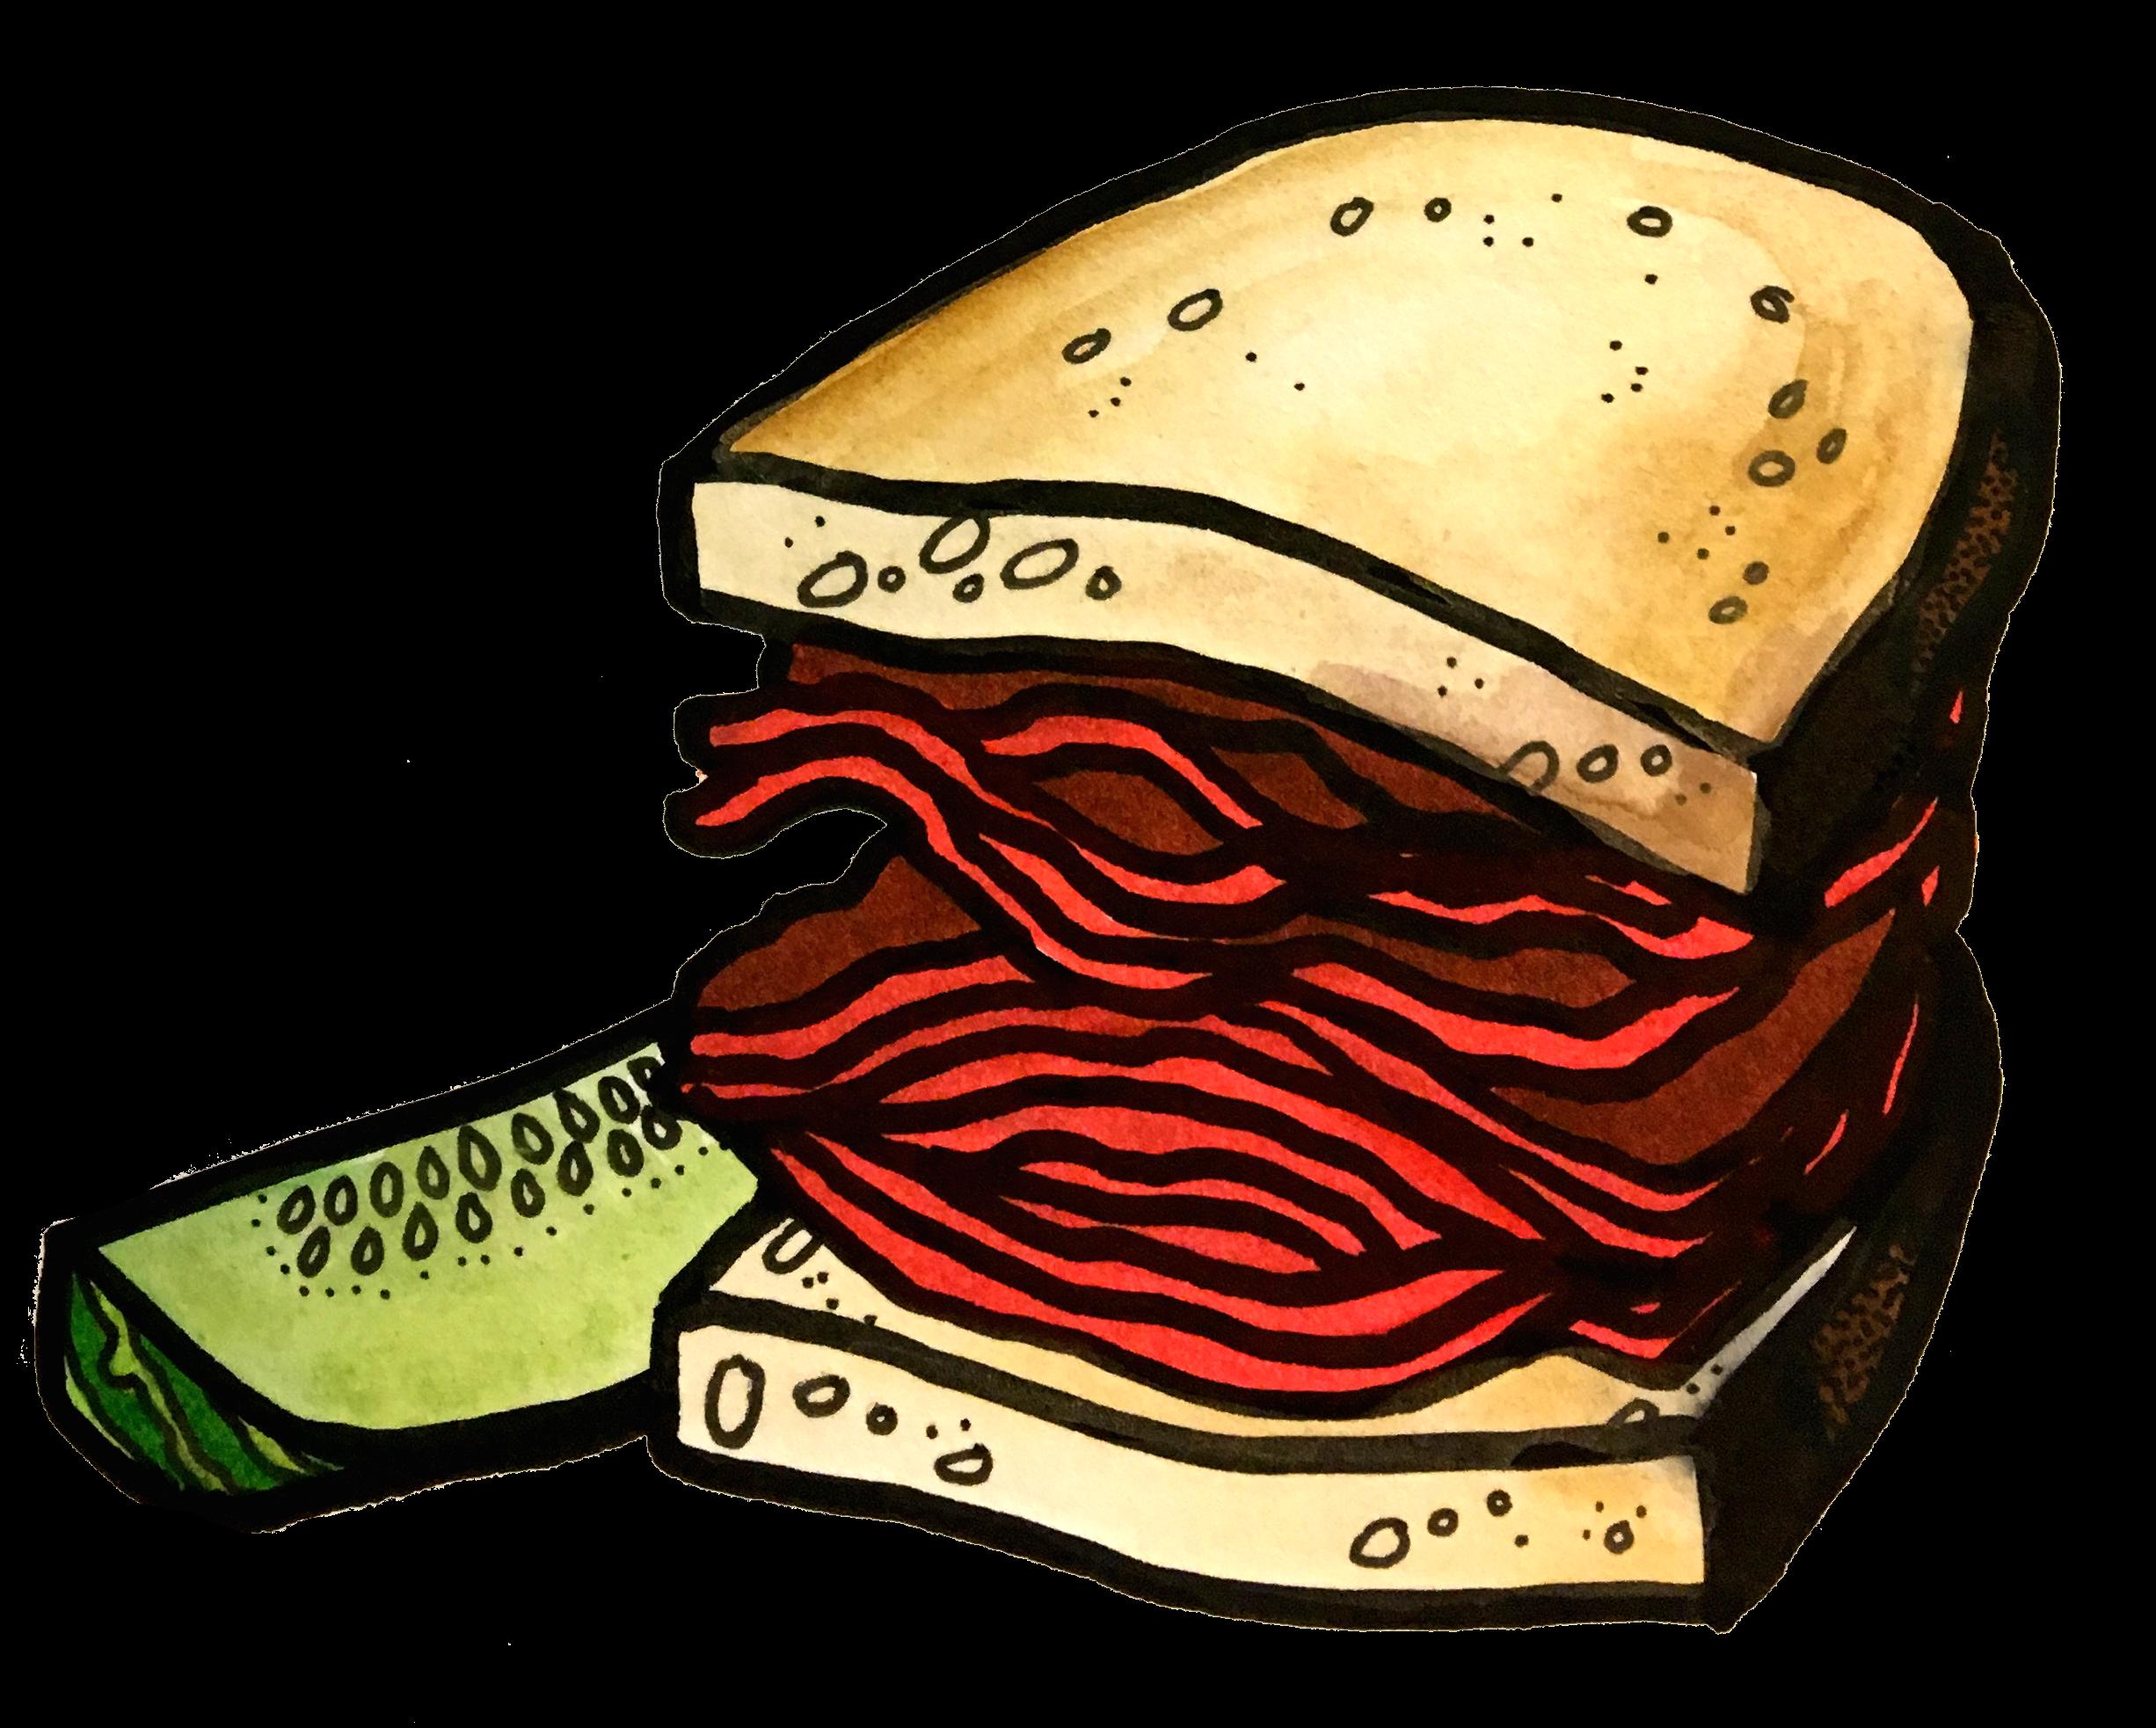 Yes hello, it's me. - I'm not really a pastrami sandwich, I'm a multidisciplinary designer.NY born & raised, Denver transplant.